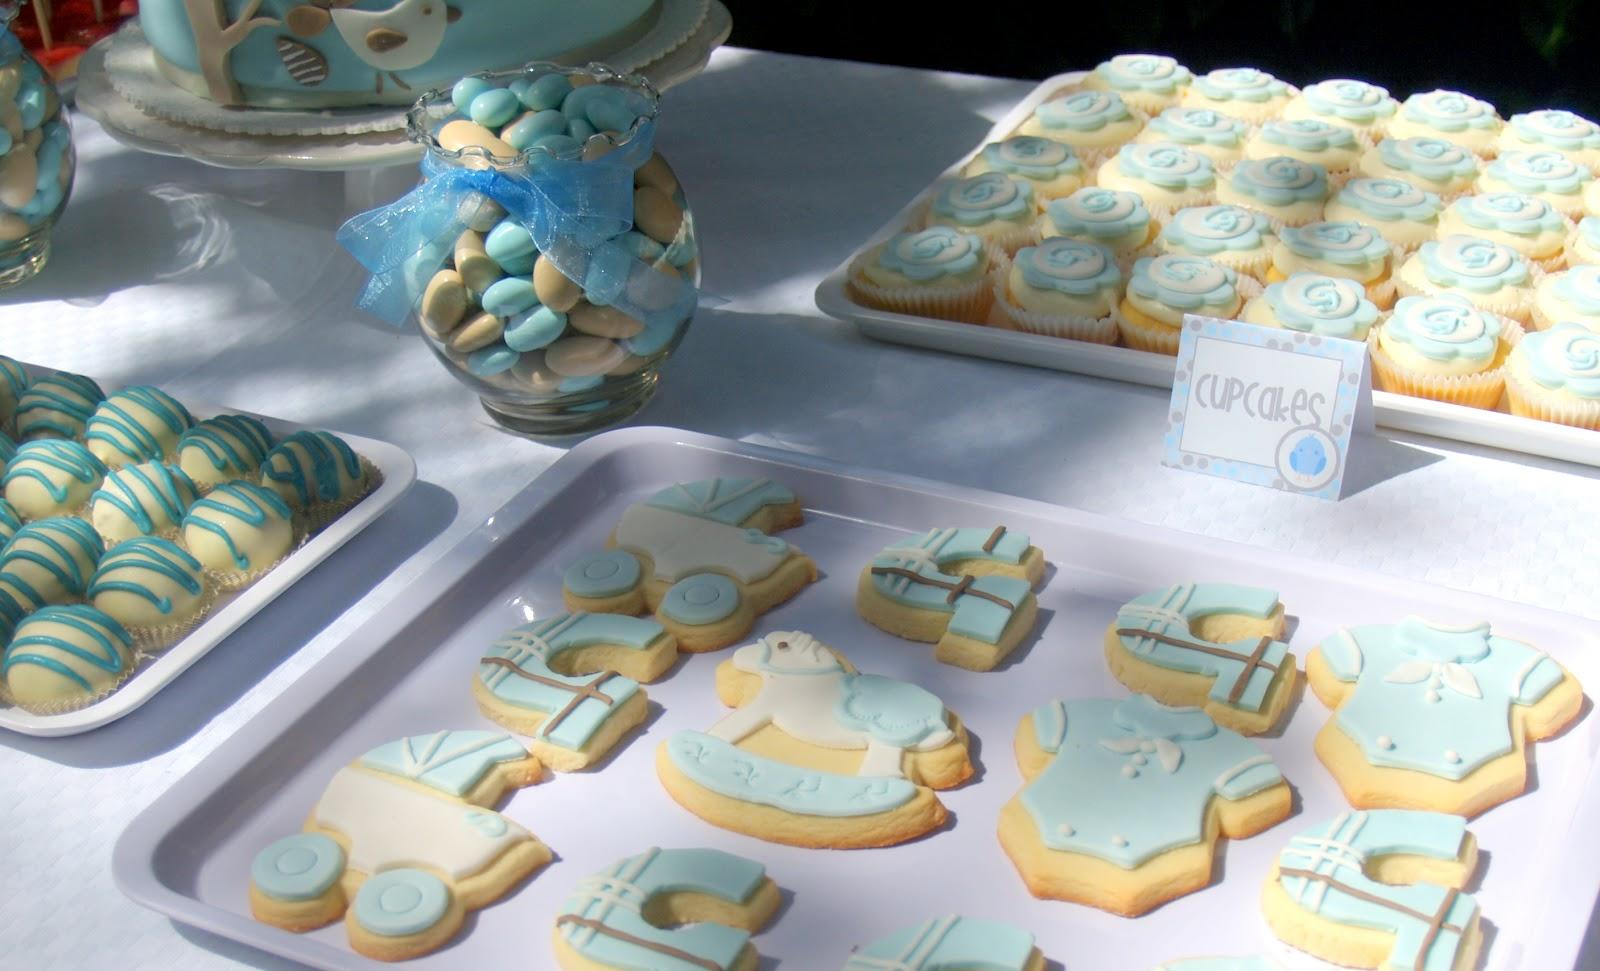 Buffet Di Dolci Battesimo : Buffet e rinfreschi ricette per buffet finger food dolci e salati